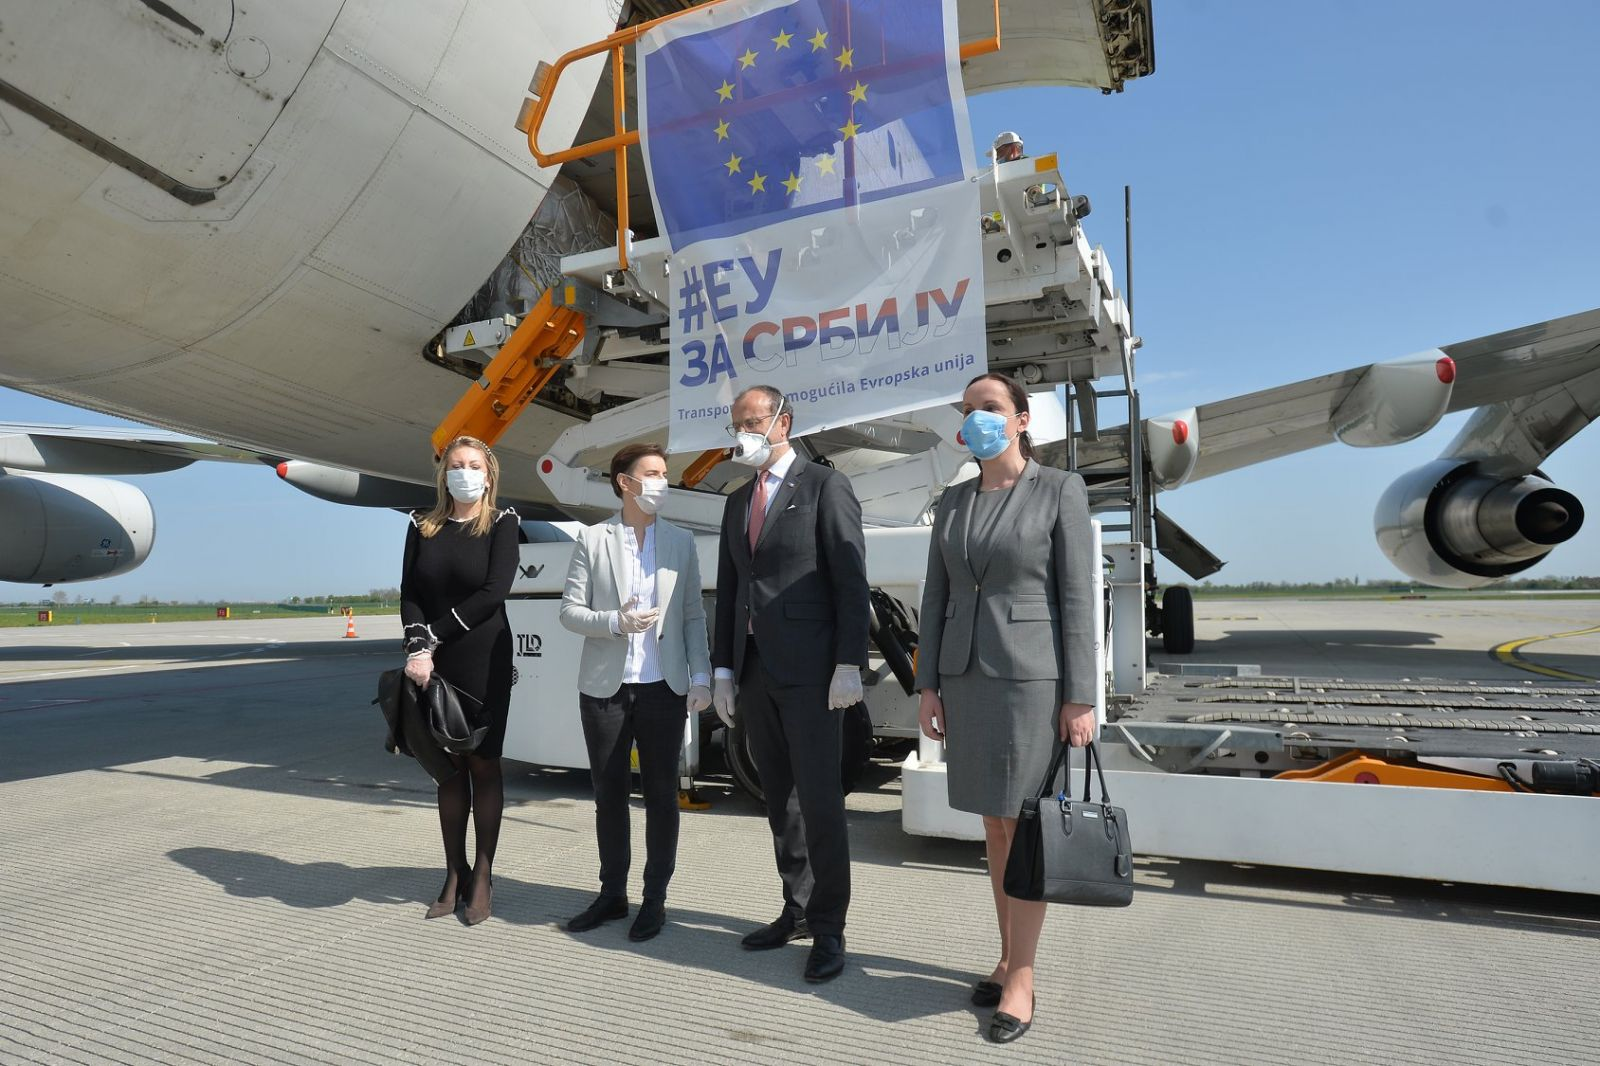 EU plane brings 800,000 masks